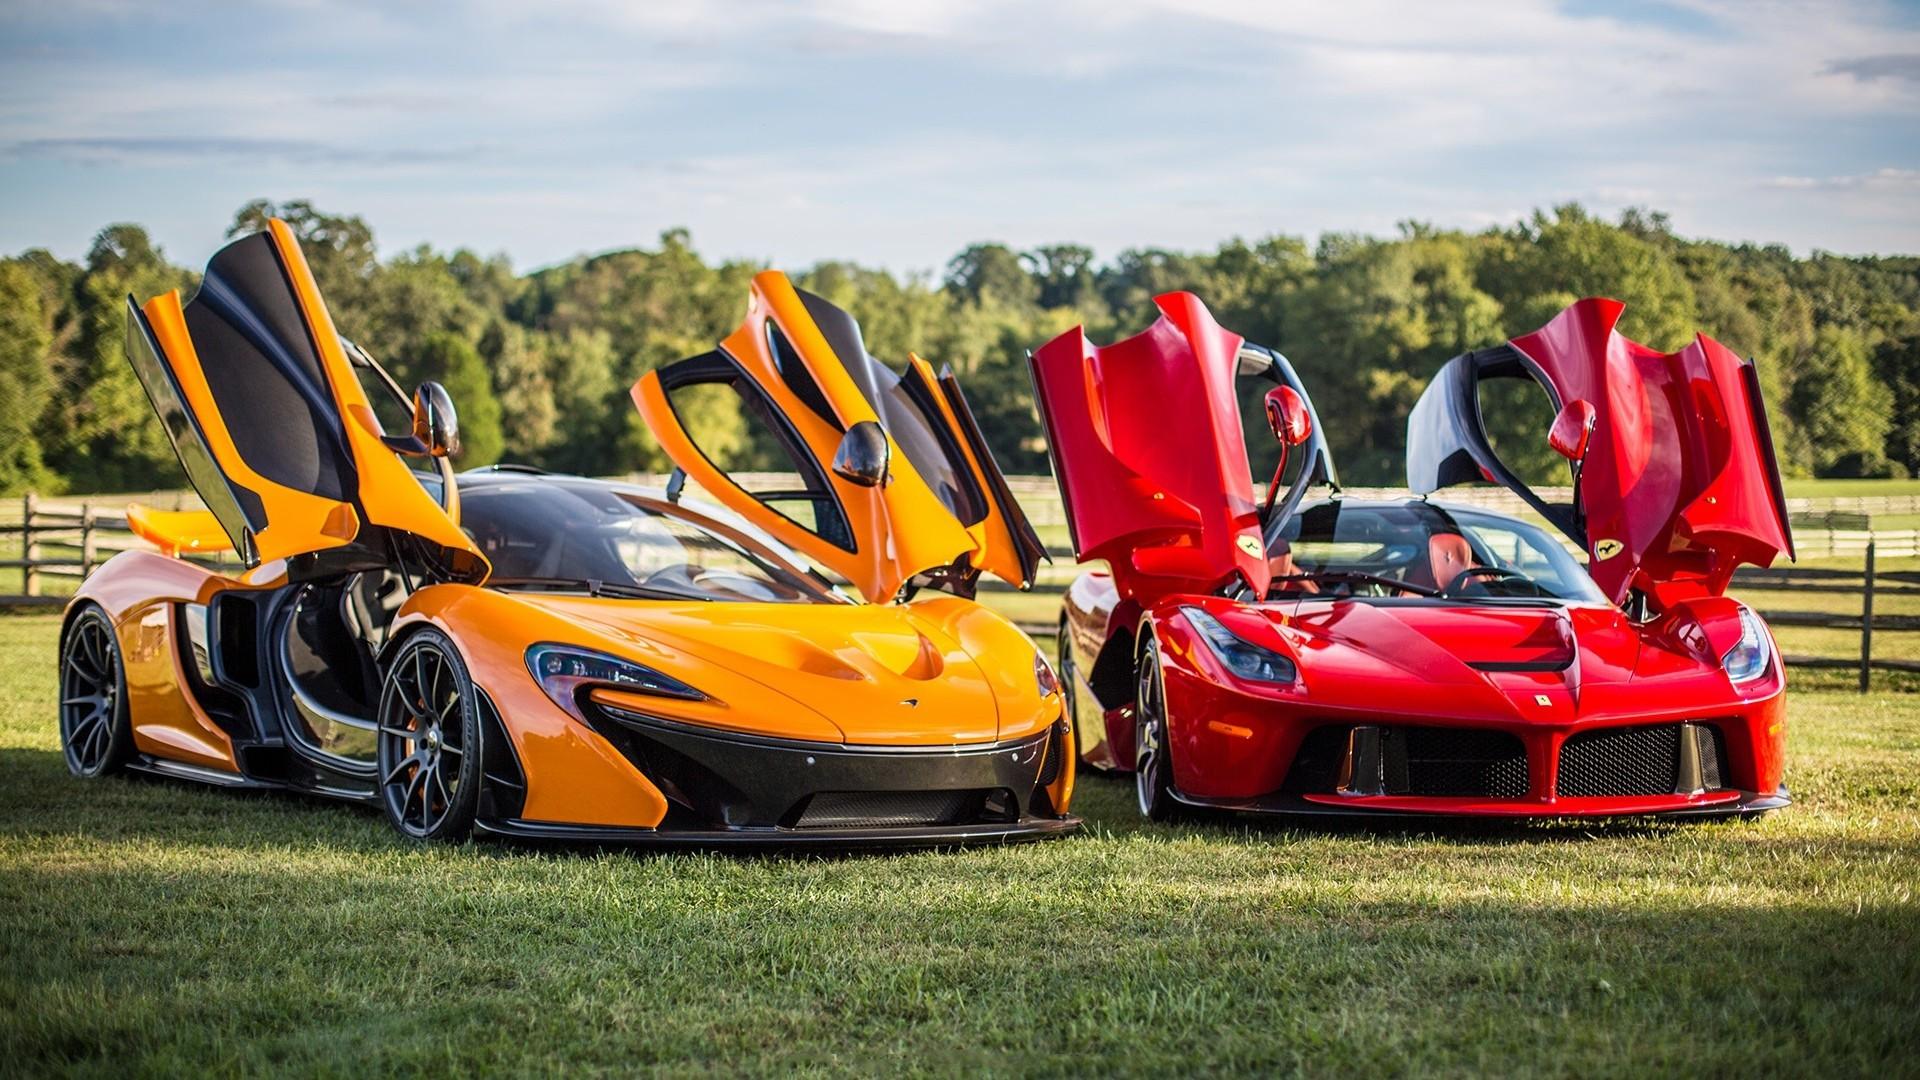 Wallpaper : Lamborghini Aventador, McLaren P1, sports car ...